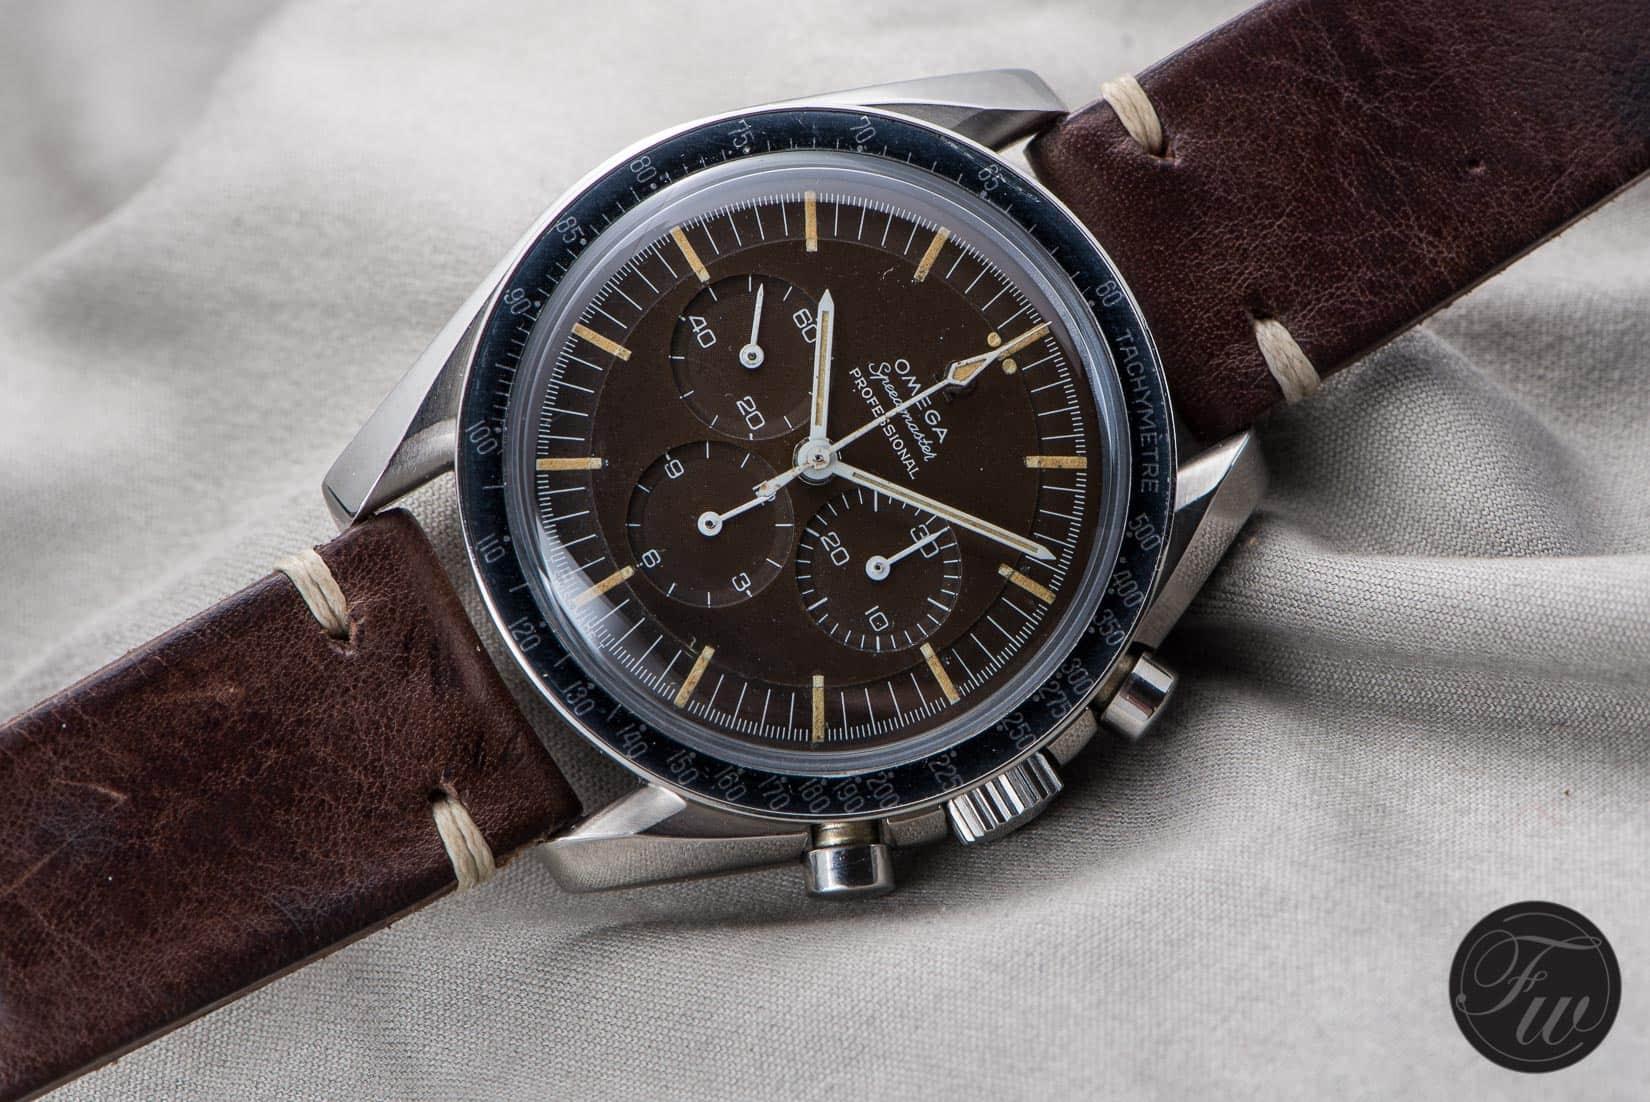 Which Modern Speedmaster Is Closest To The Original Moonwatch